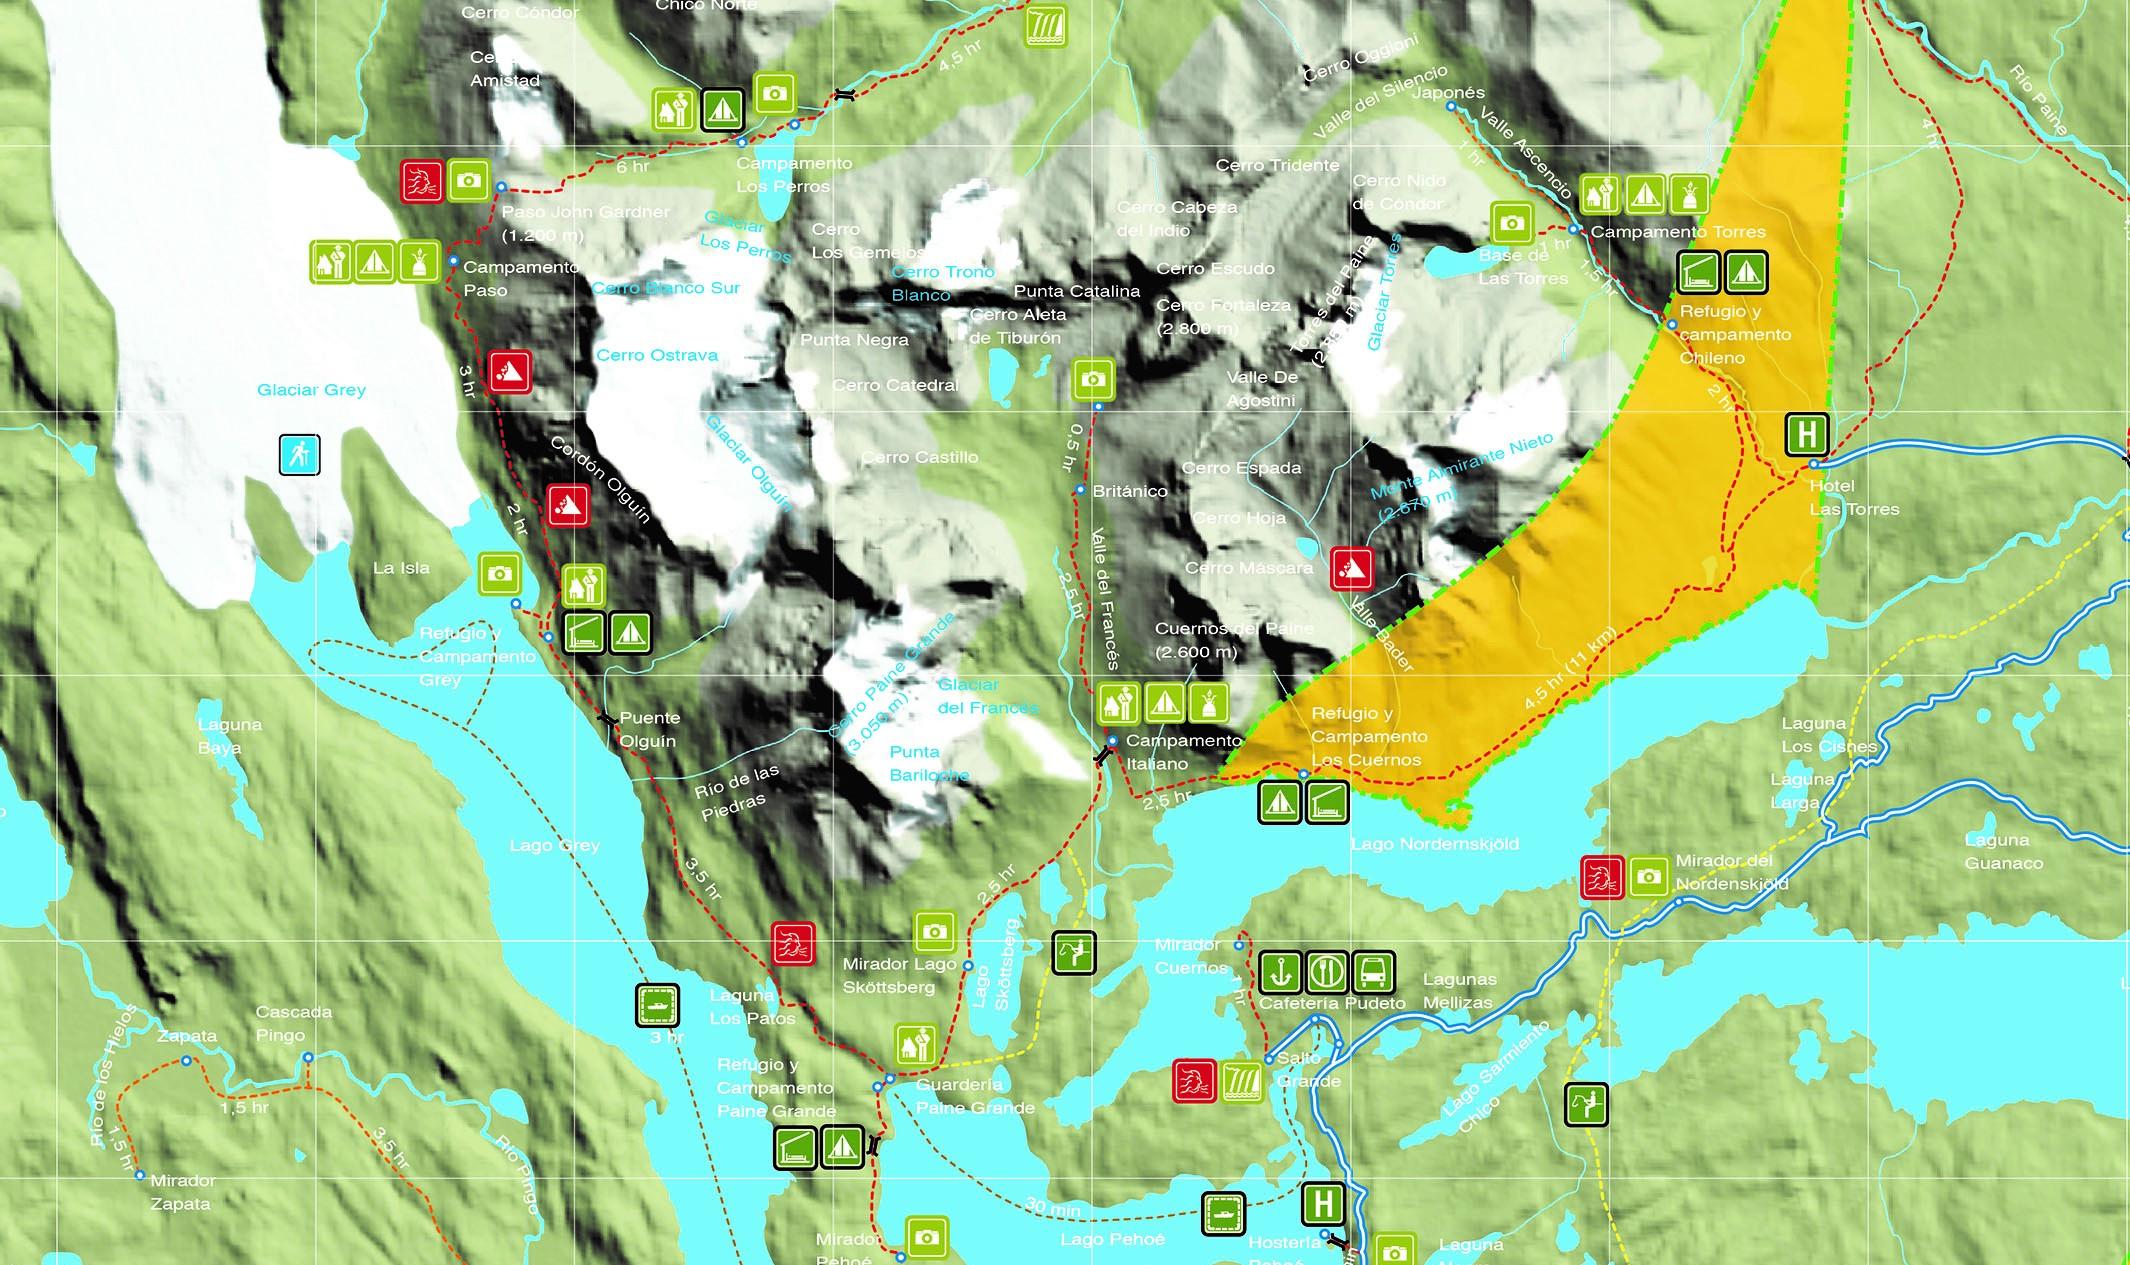 Circuito W Mapa : February 2016 pentraveler